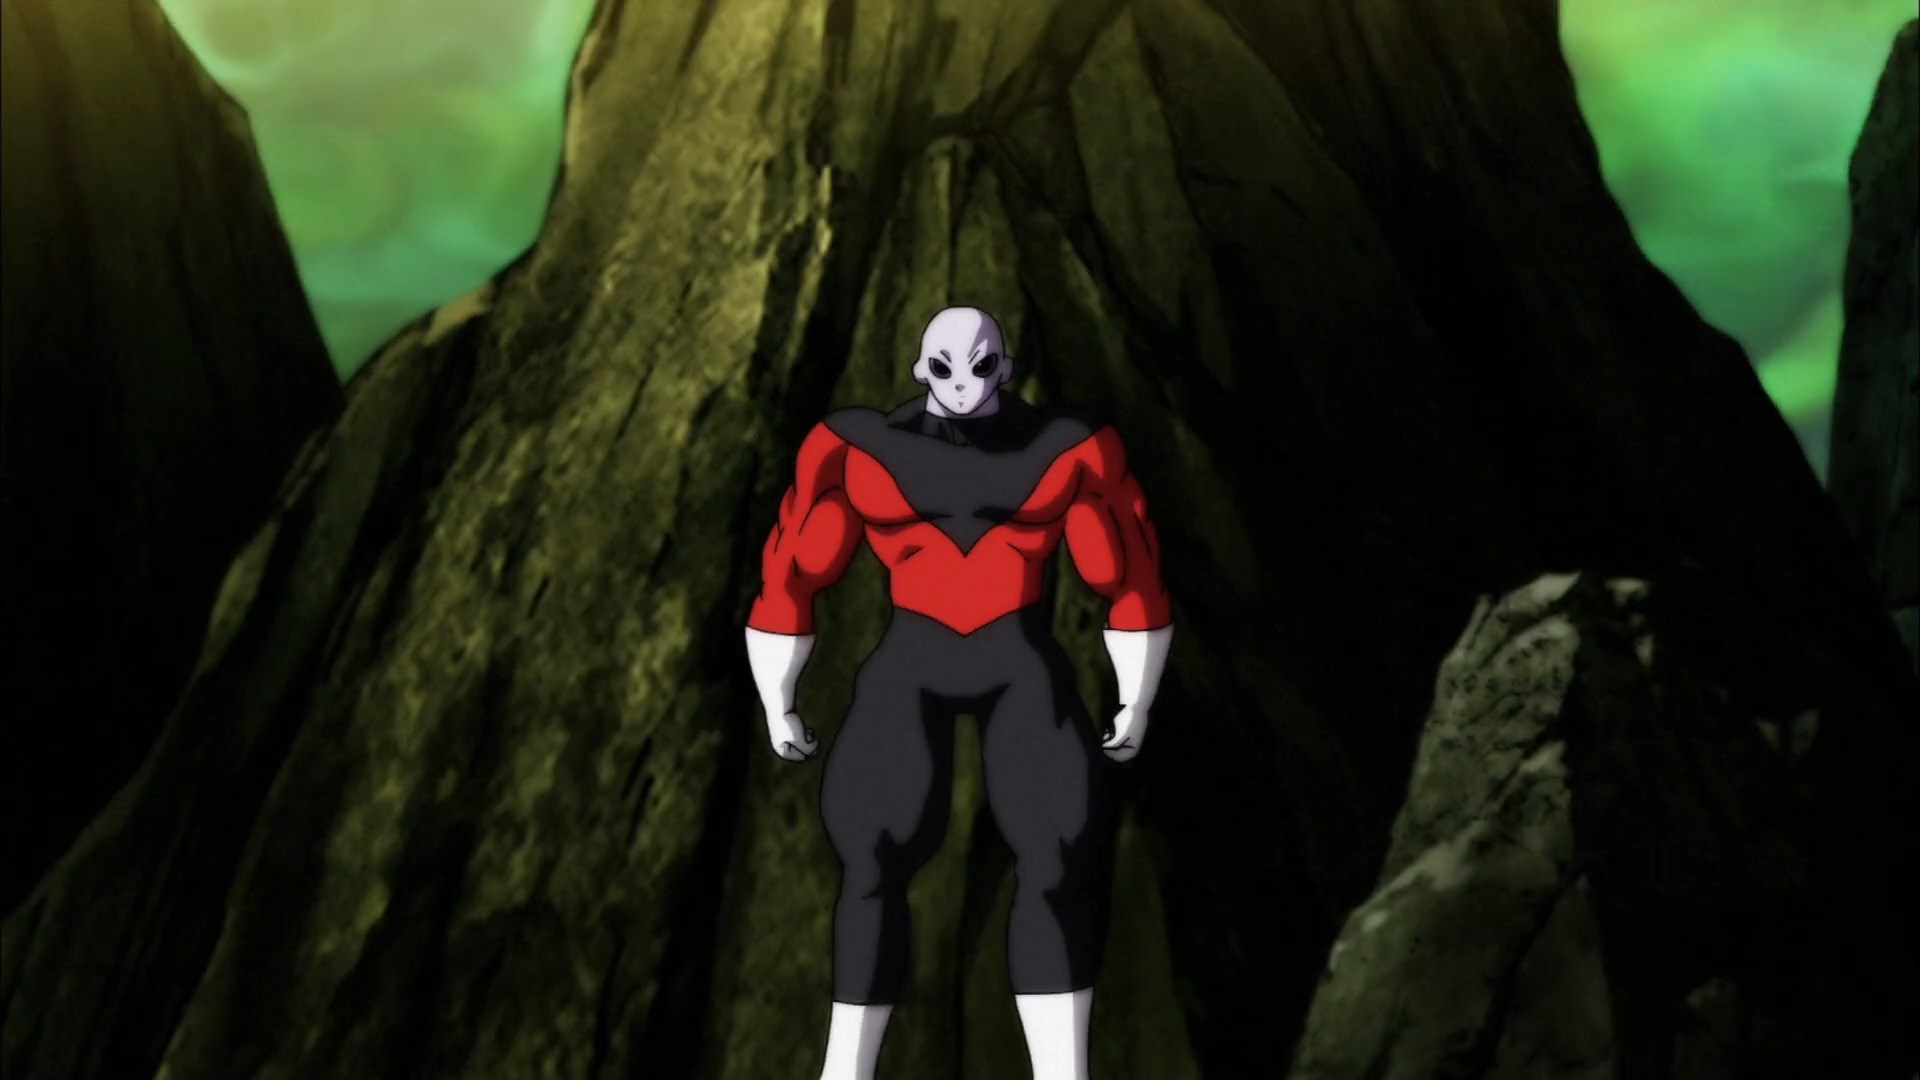 [HorribleSubs] Dragon Ball Super - 121 [1080p].mkv_snapshot_23.10